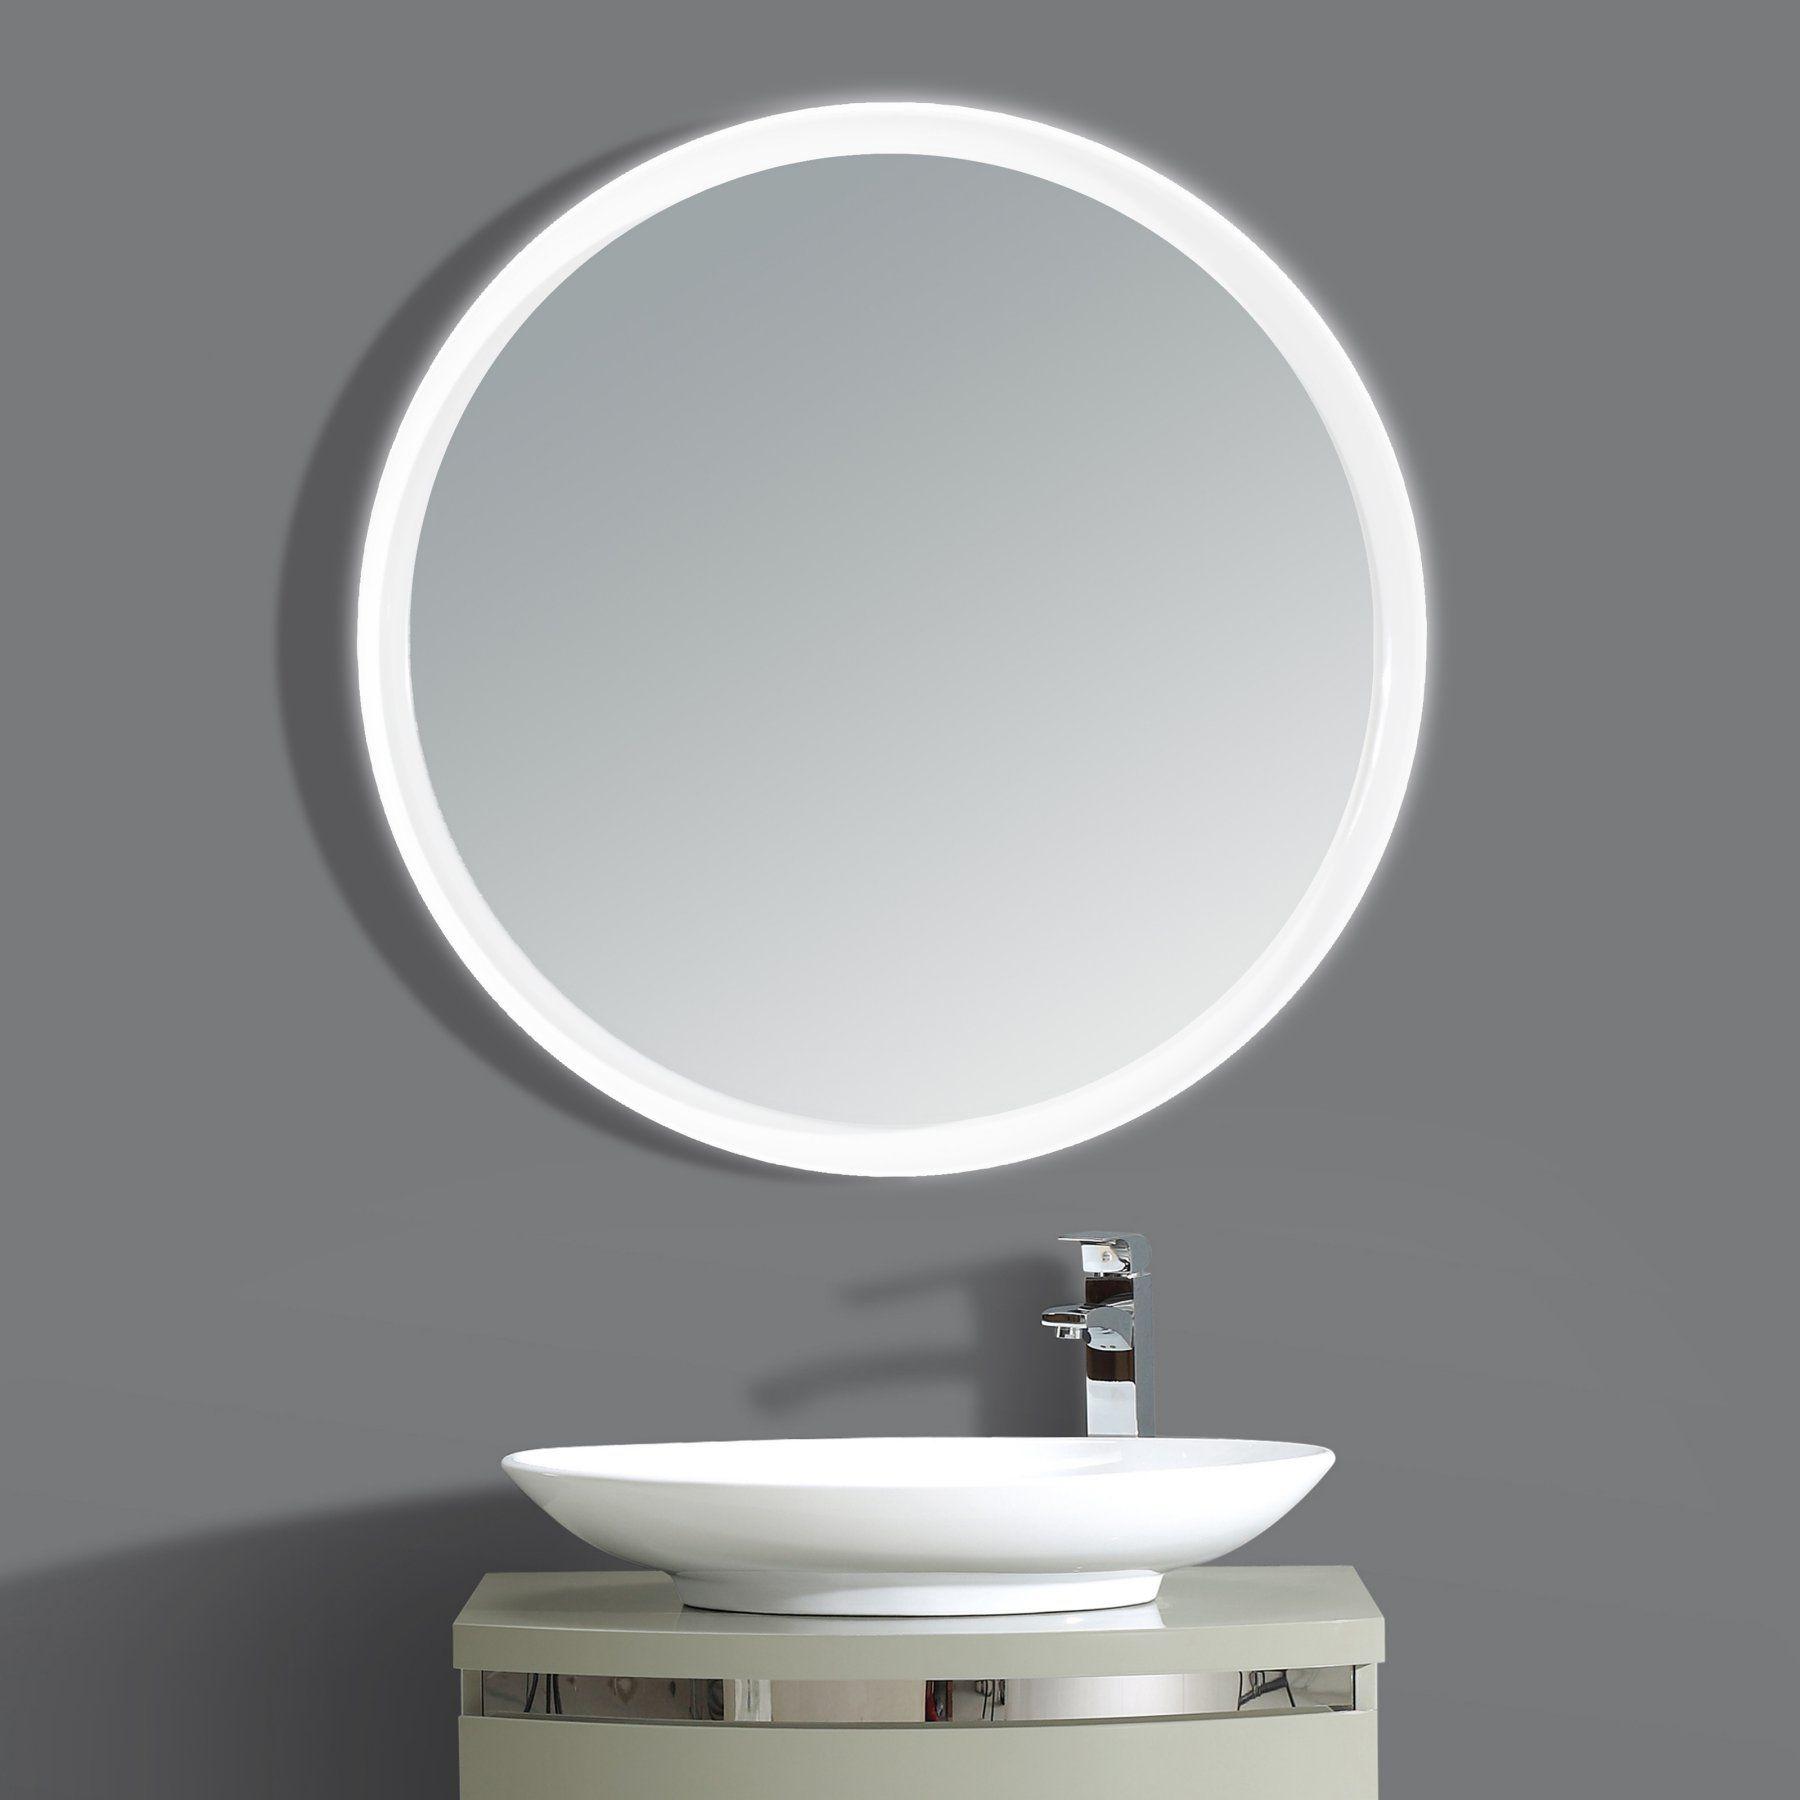 OVE Decors Aries LED Bathroom Mirror - ARIES LED MIRROR   Pinterest ...